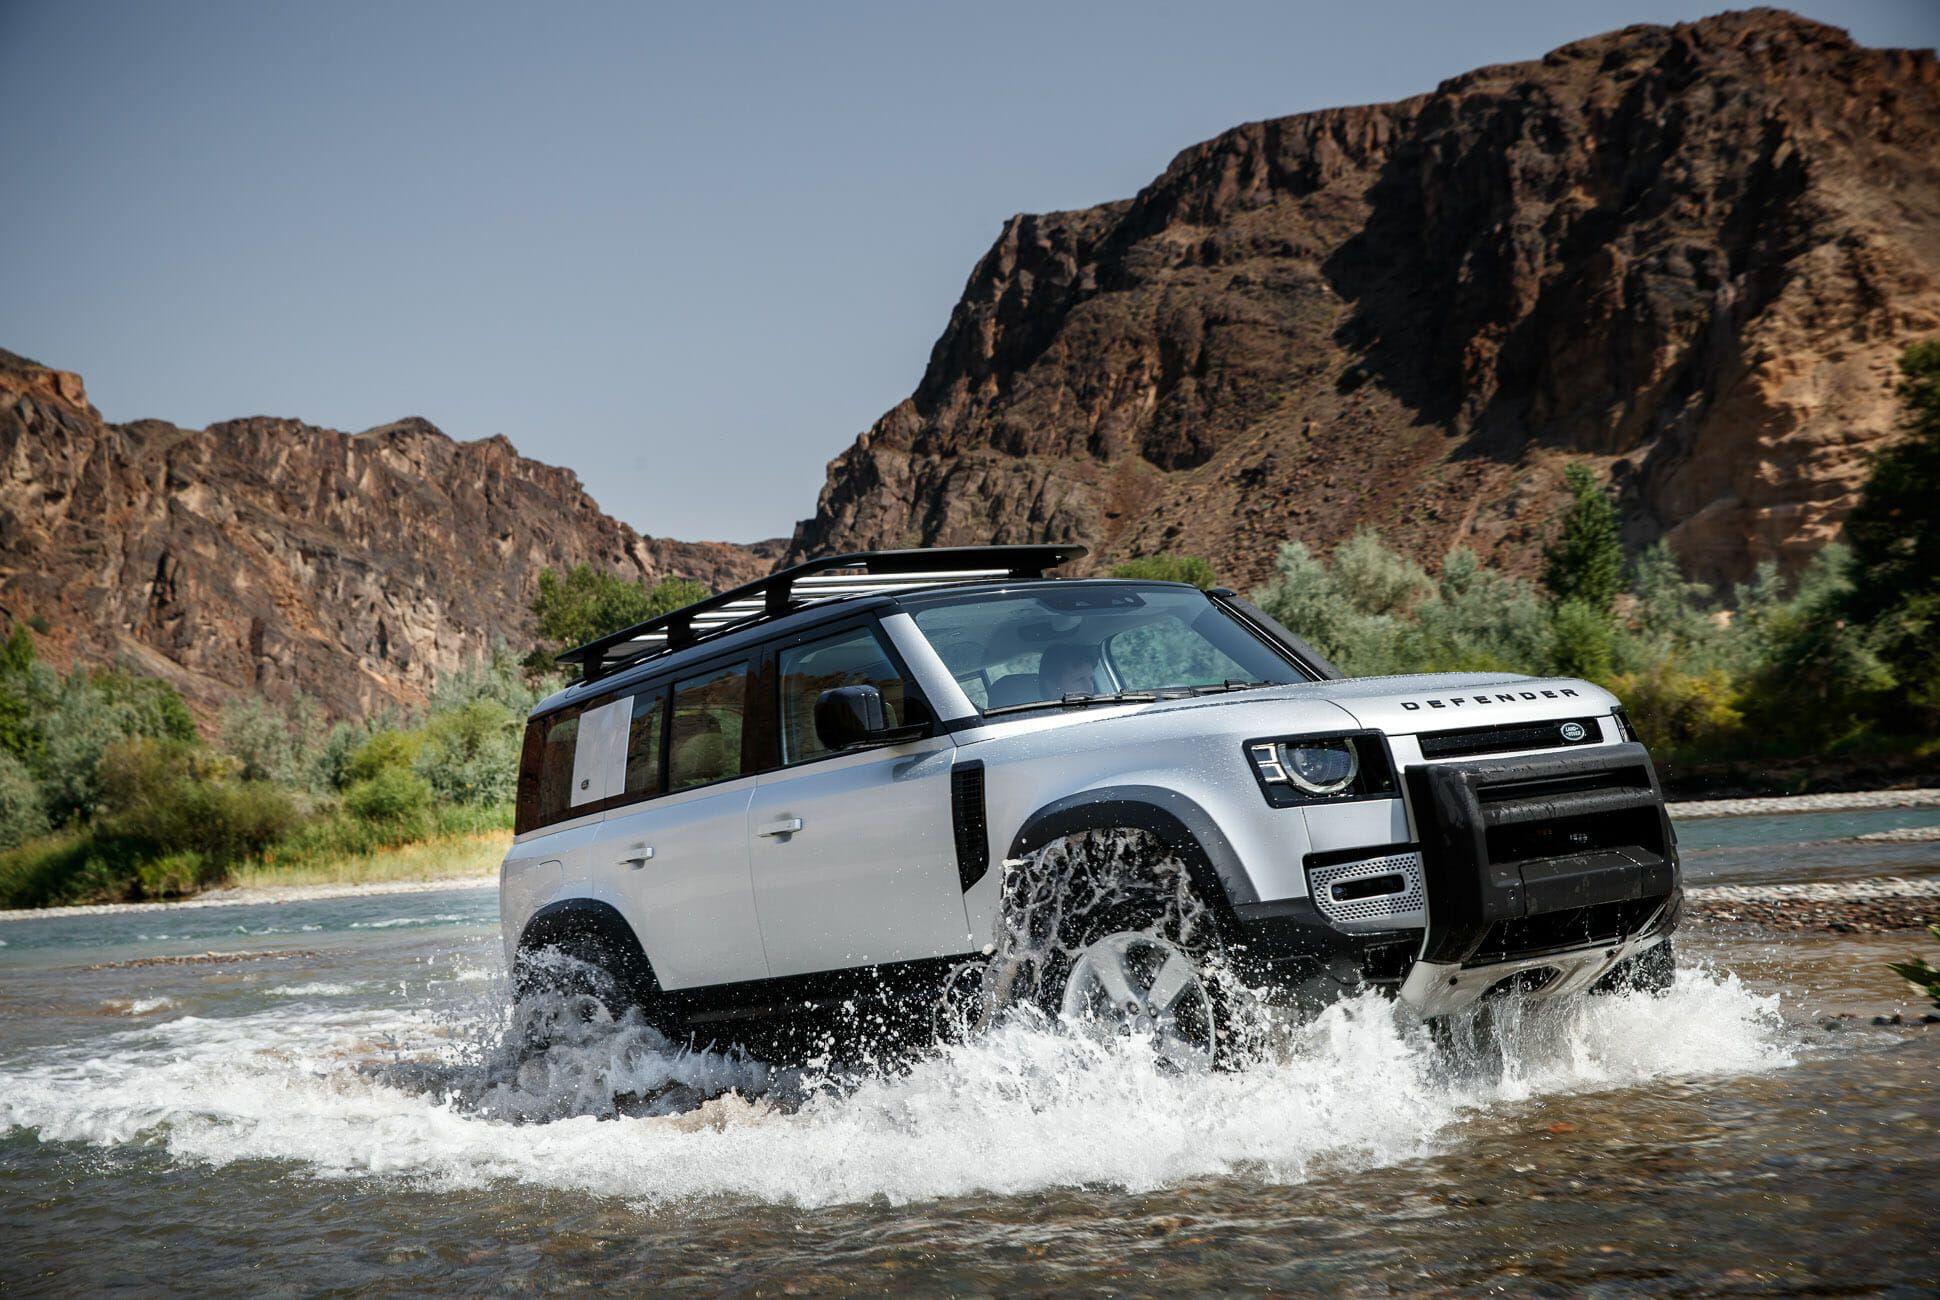 Land Rover Defender Gear Patrol-Exterior Action-Slide-20